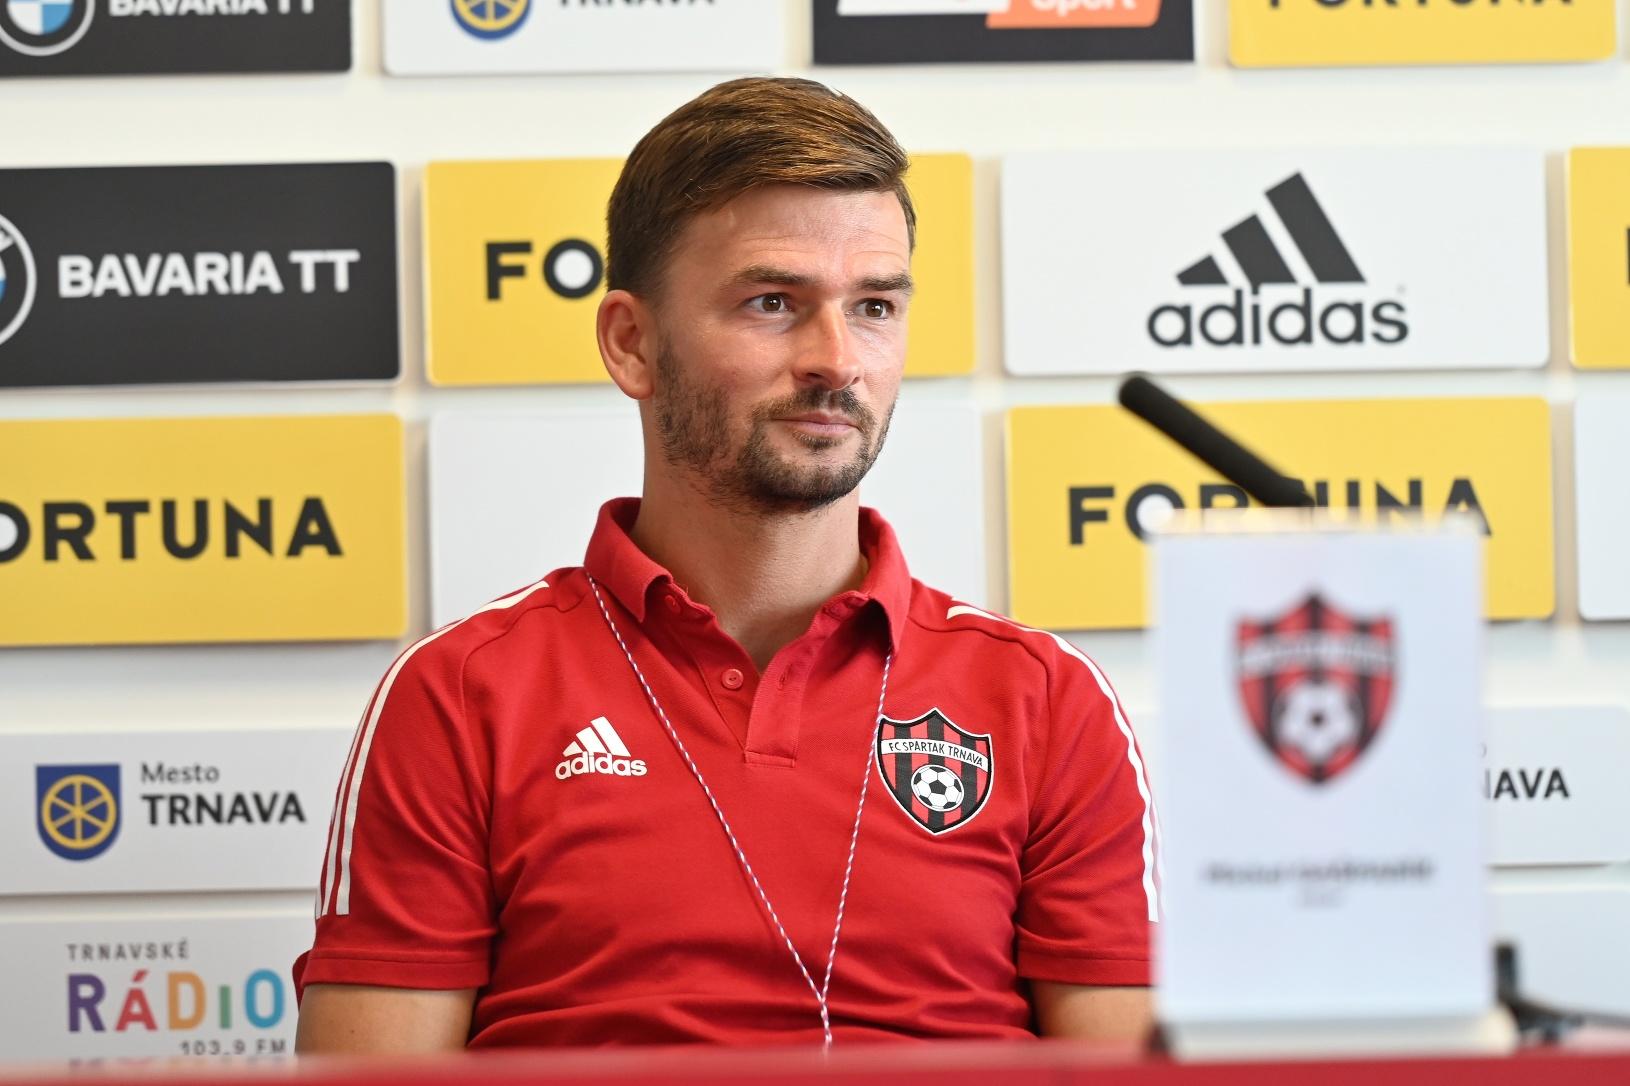 Tréner Trnavy Michal Gašparík